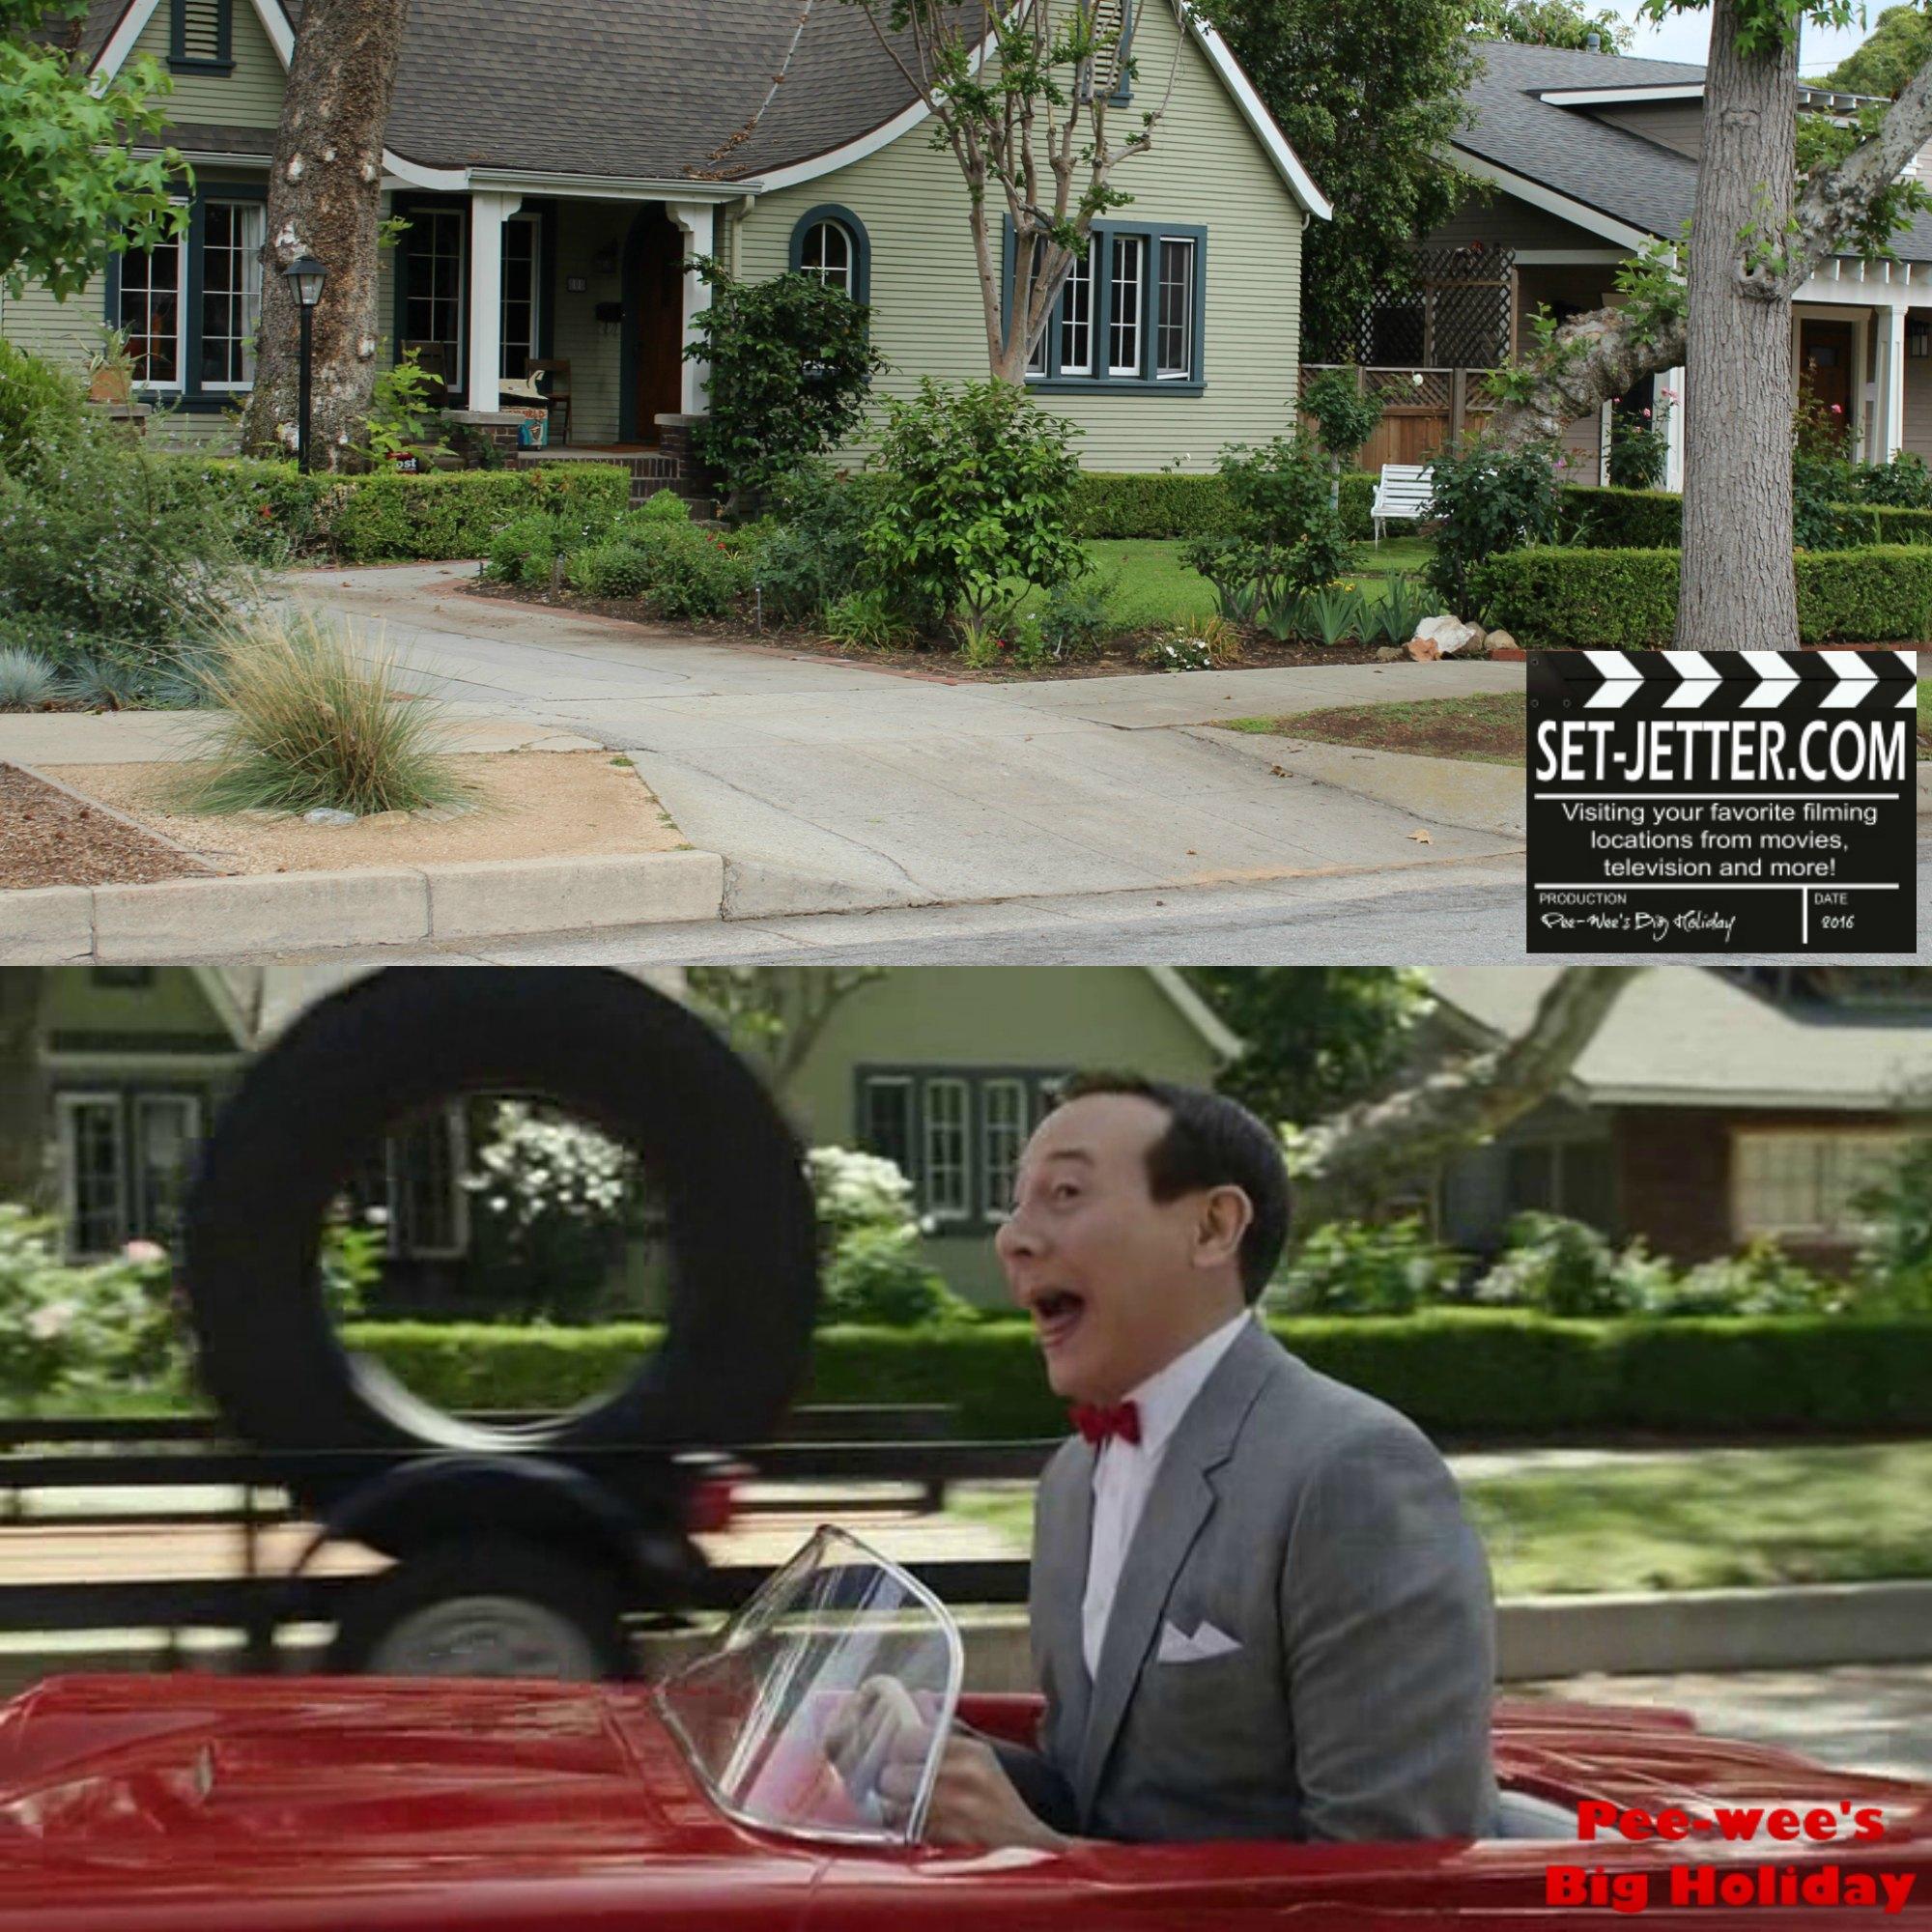 Pee Wee's Big Holiday comparison 213.jpg